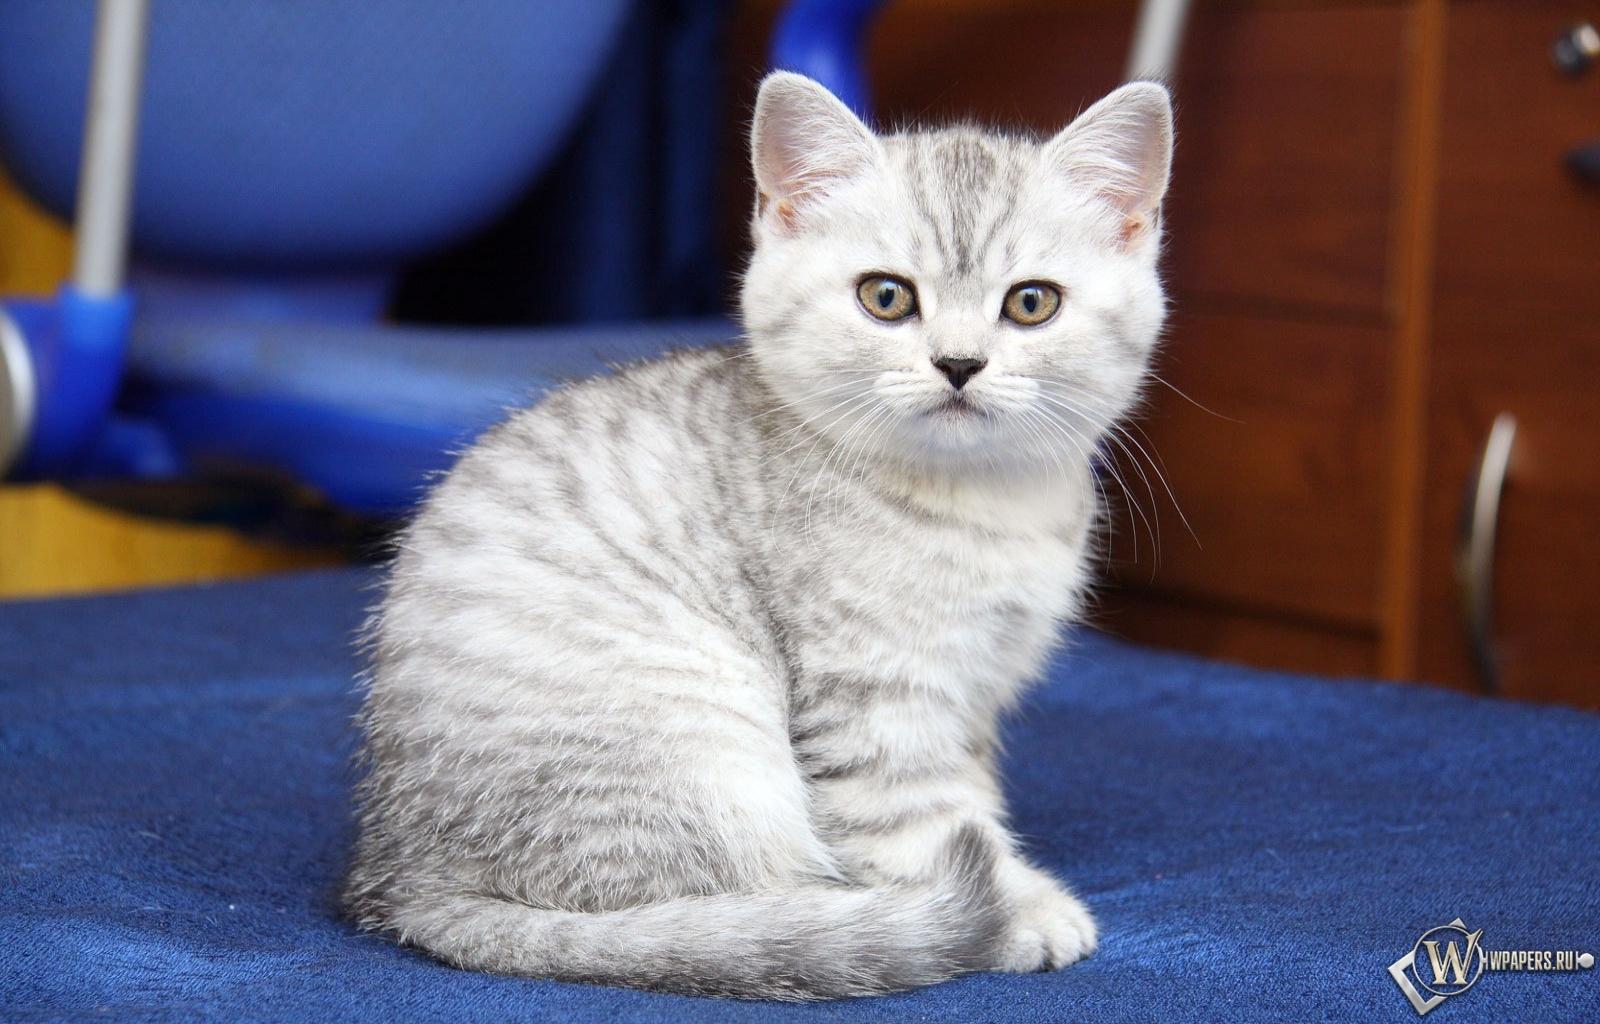 Серый котик 1600x1024